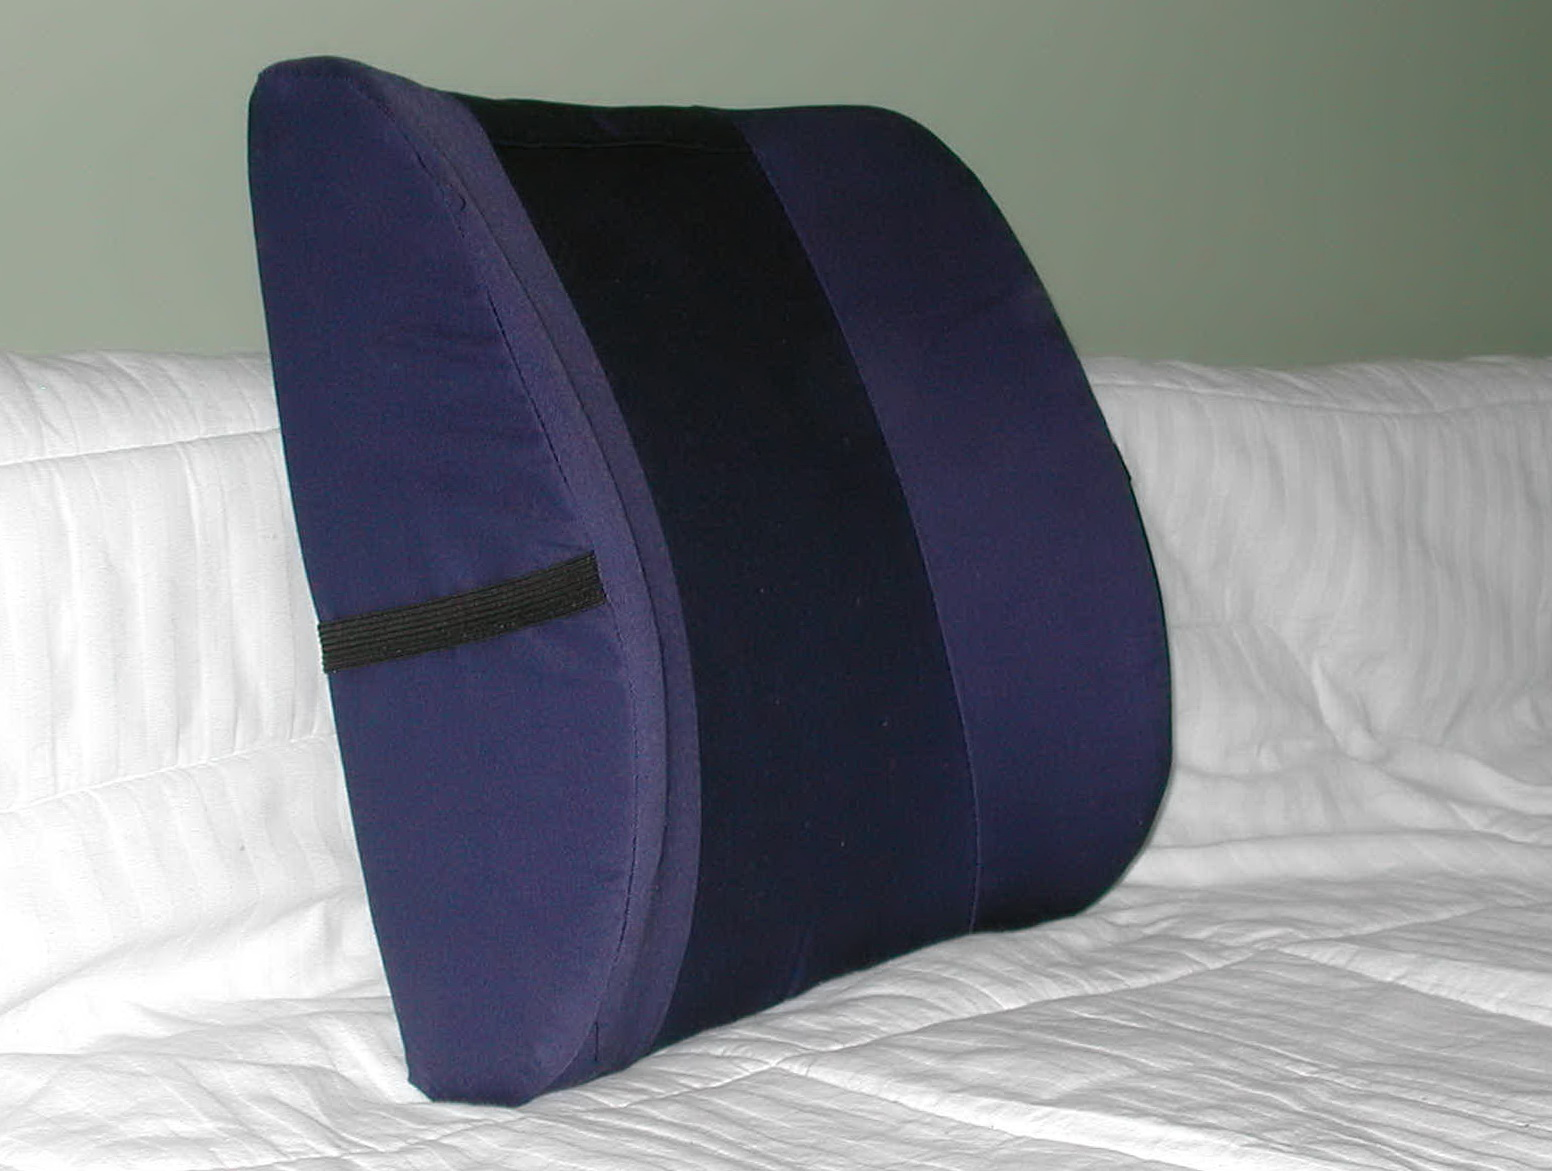 Roho Seat Cushion Instructions